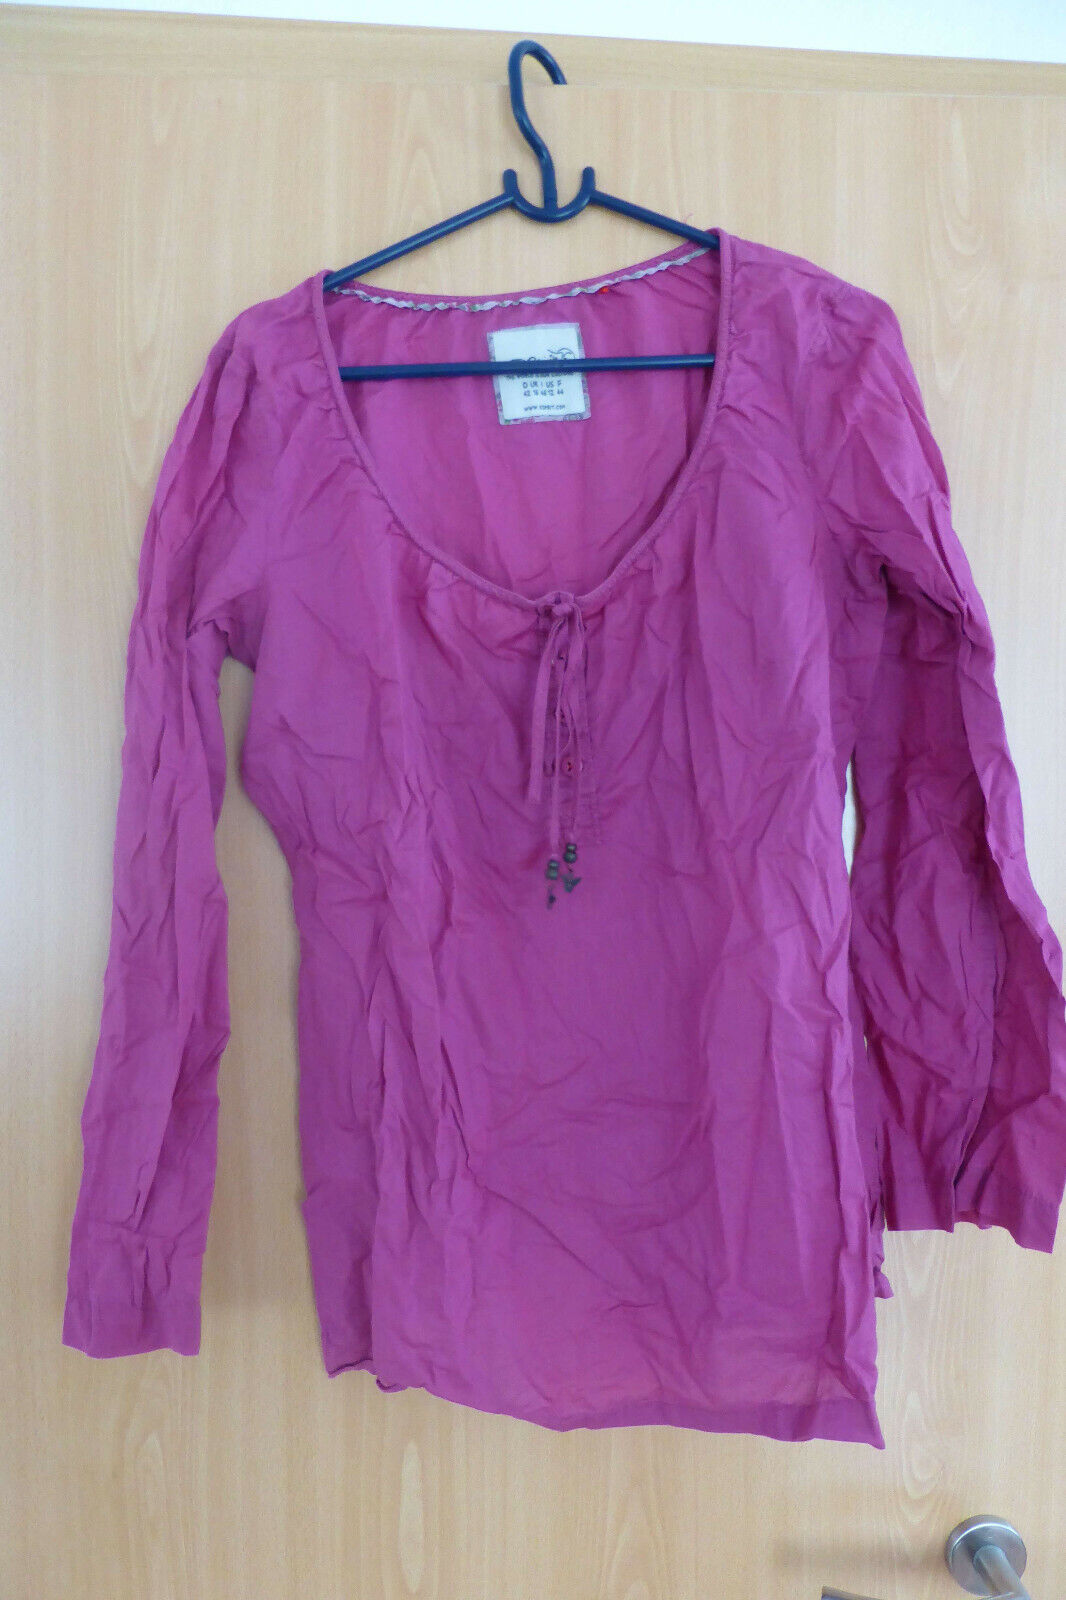 Damenbluse, langarm, rötlich-pink, Esprit, 42